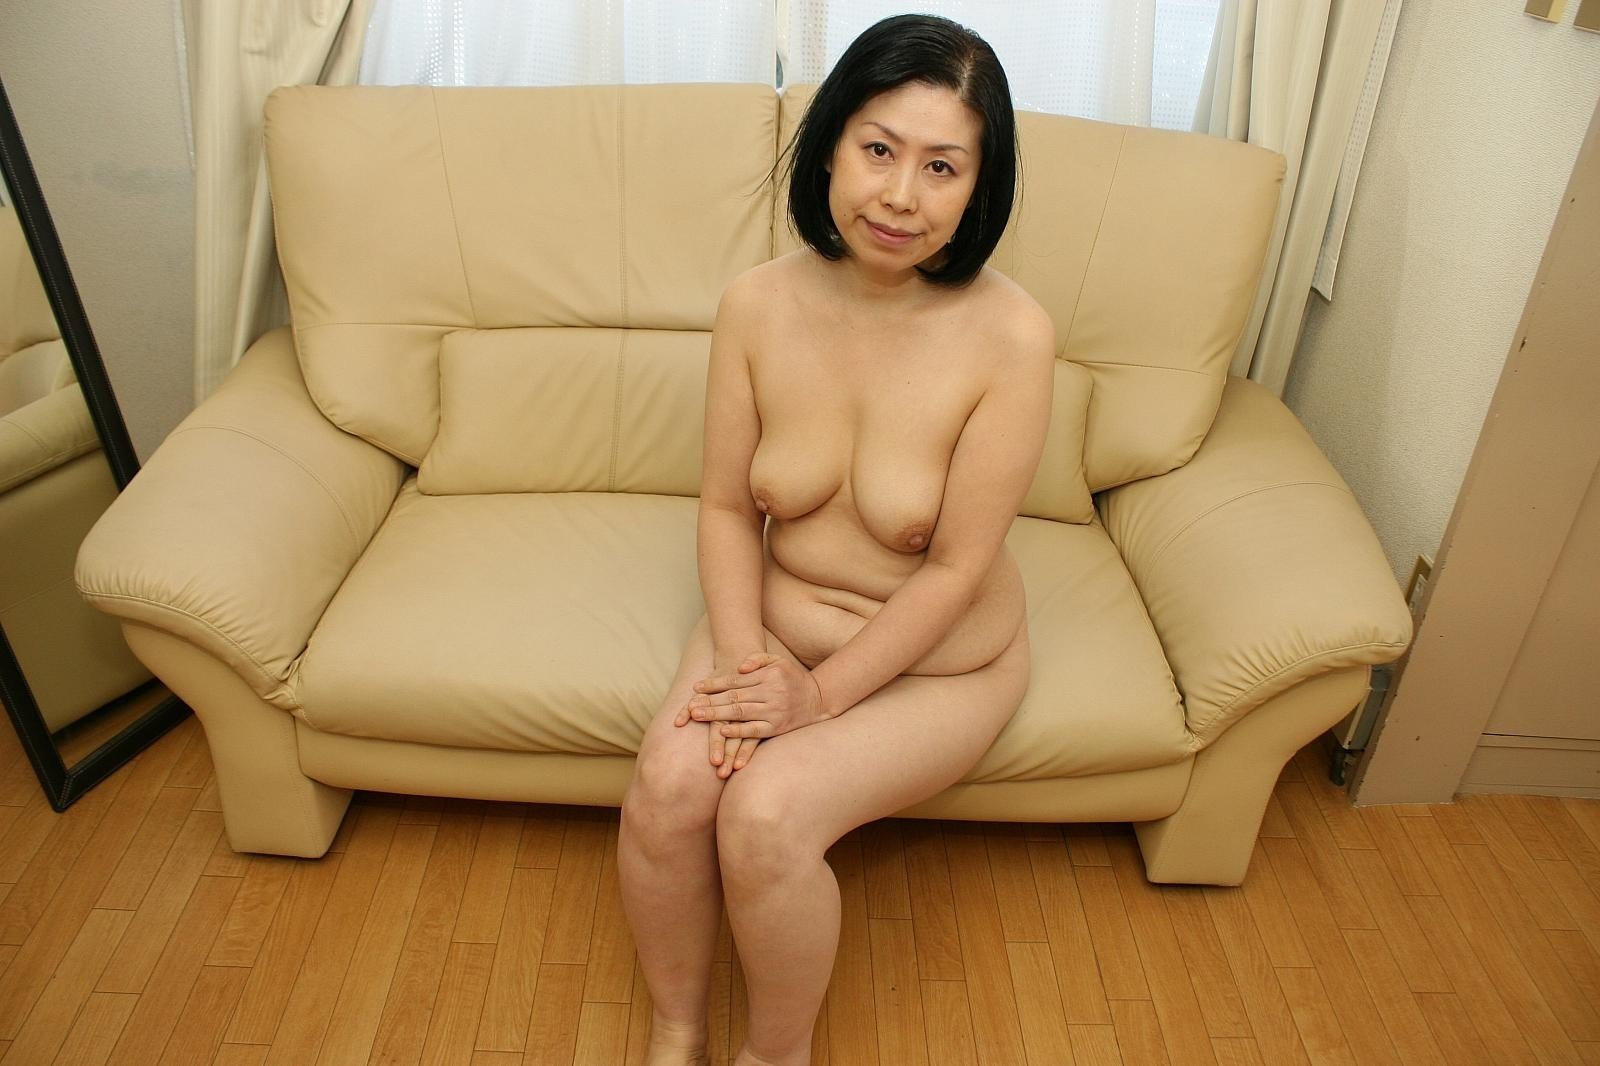 Asian Women Nude Free In Free Asian Upskirt Pic, Free Nude Asian Women Photos